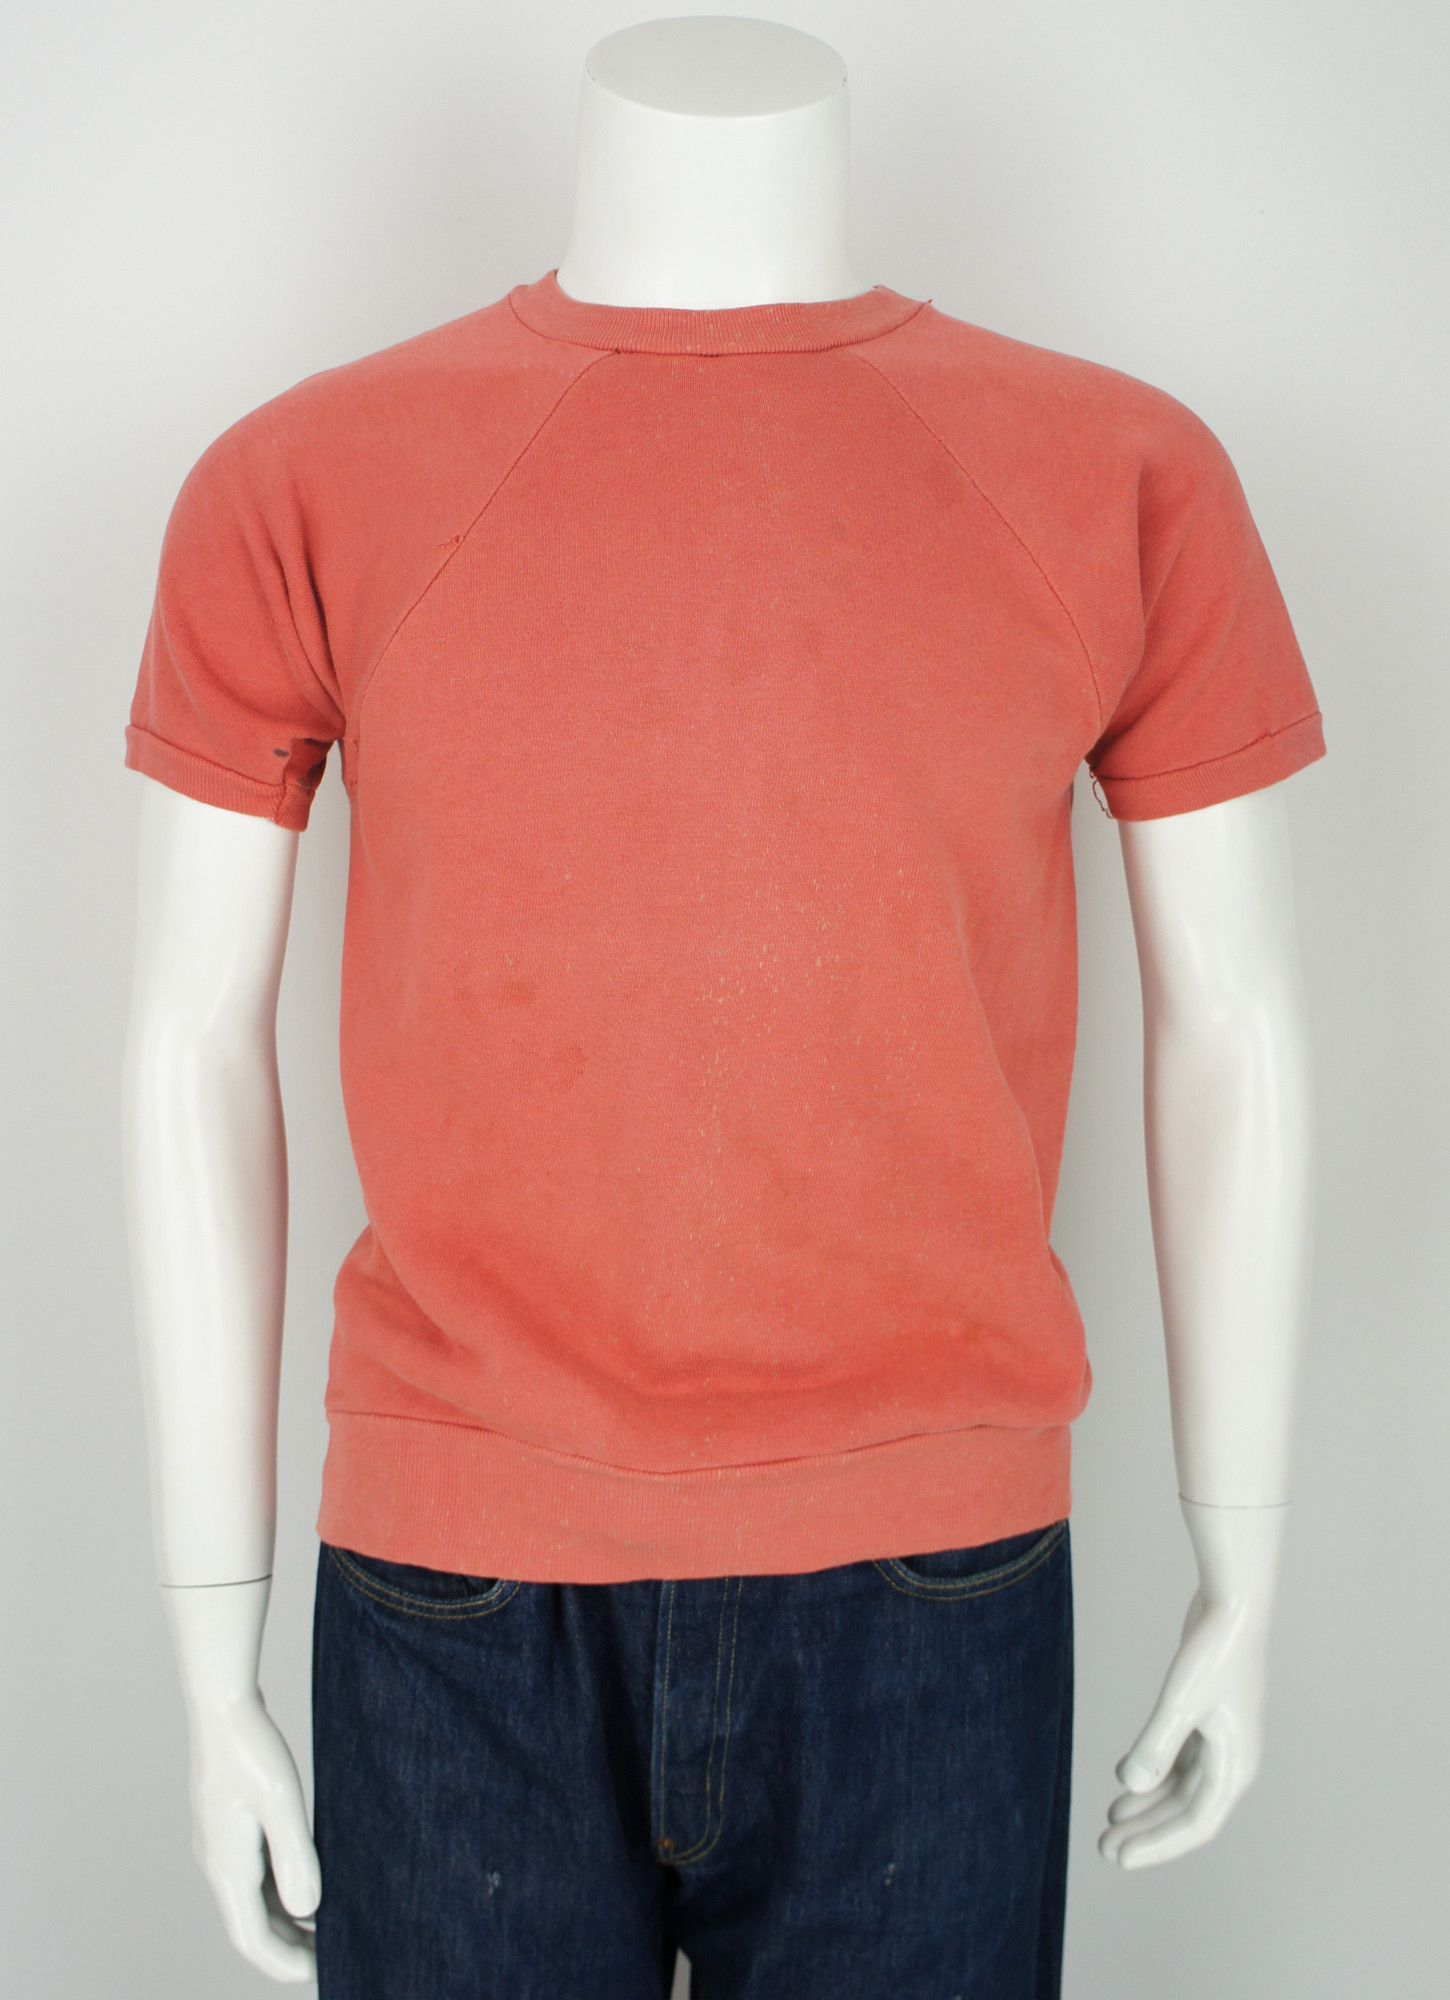 60's Faded Red Sweatshirt